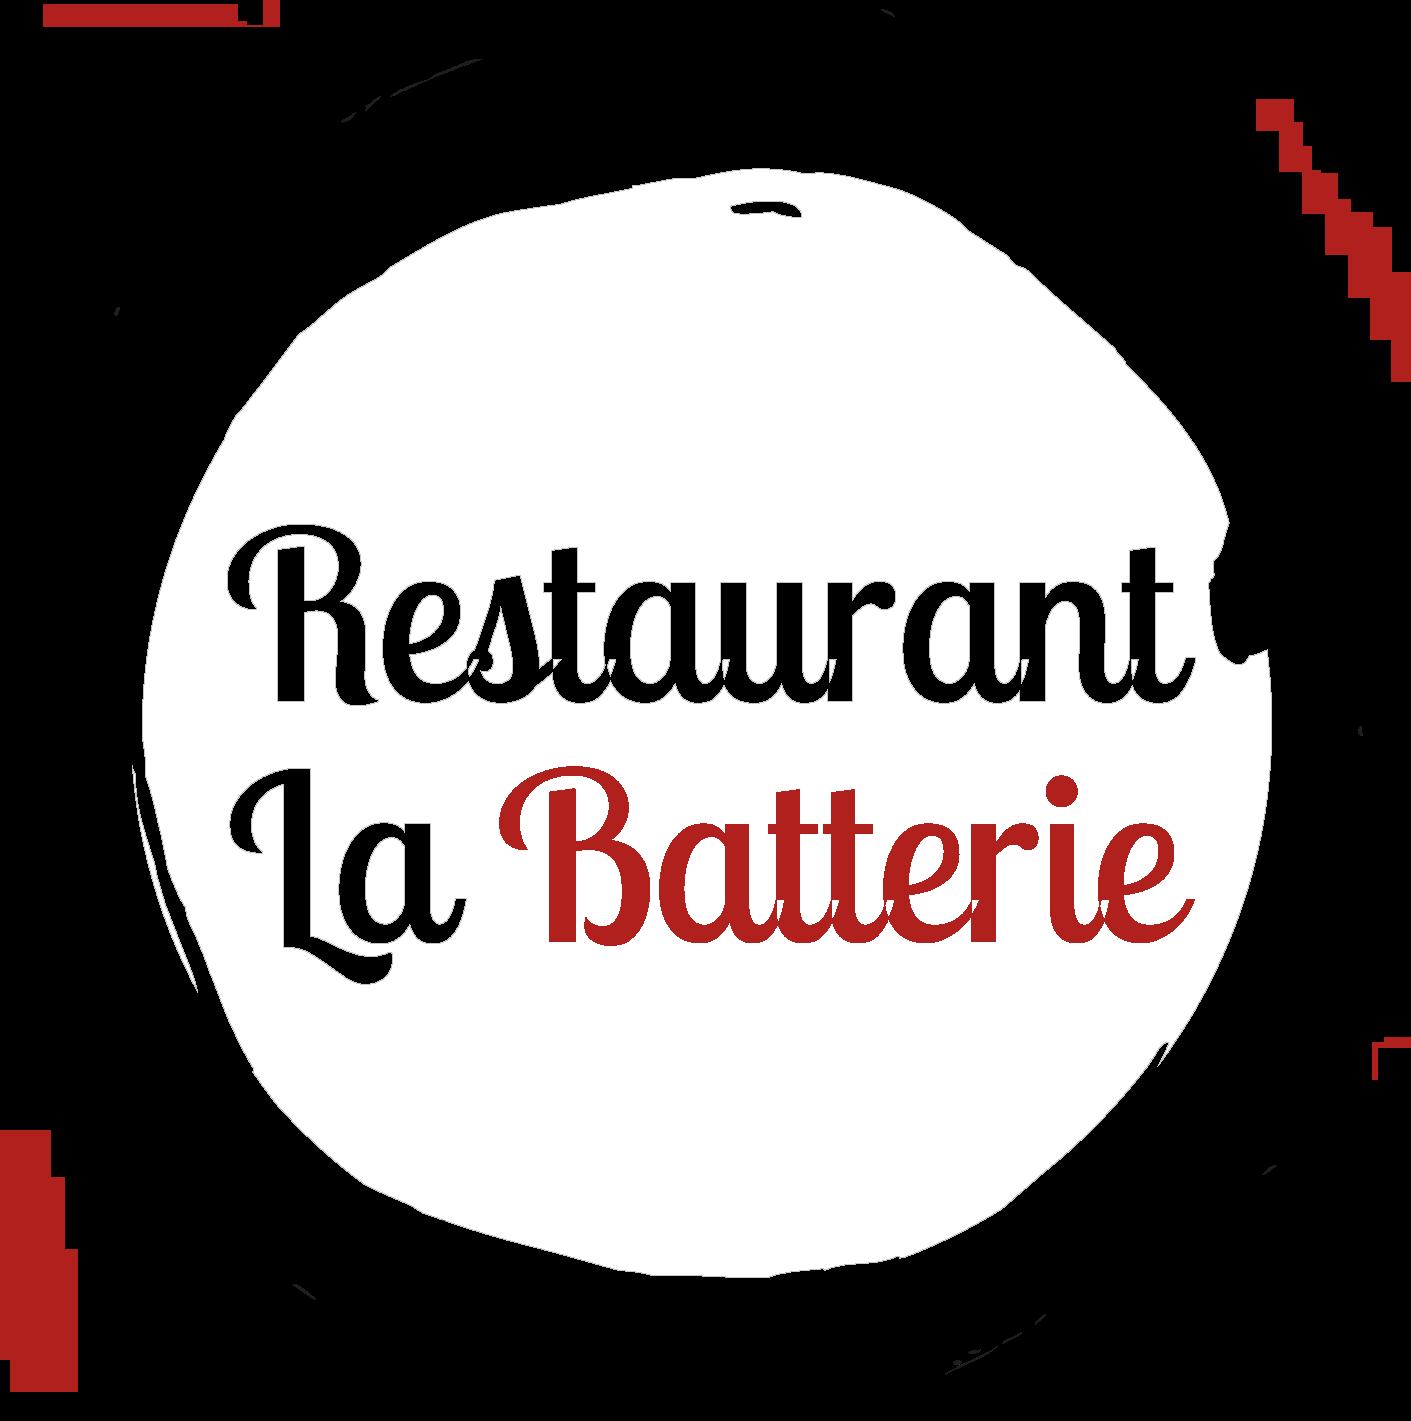 LOGO LA BATTERIE RESTAURANT BATTERIE ROU